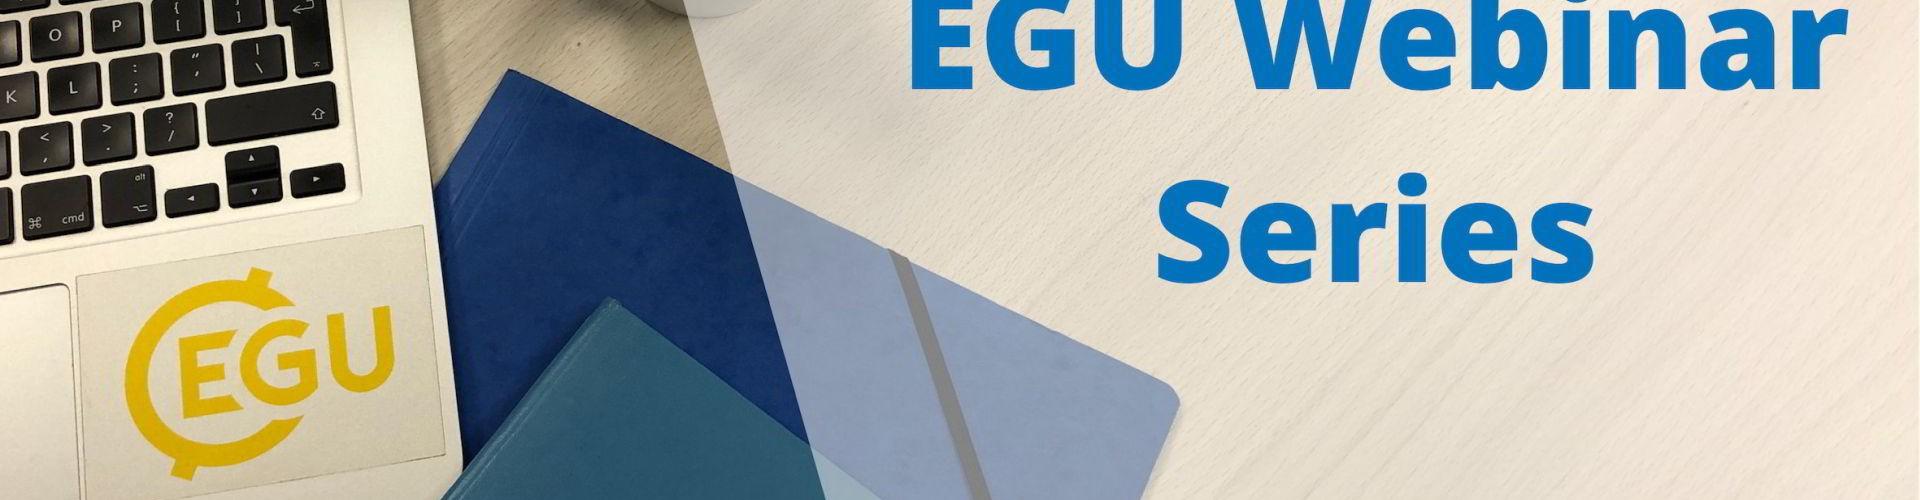 egu_webinar_series_cover2.jpg